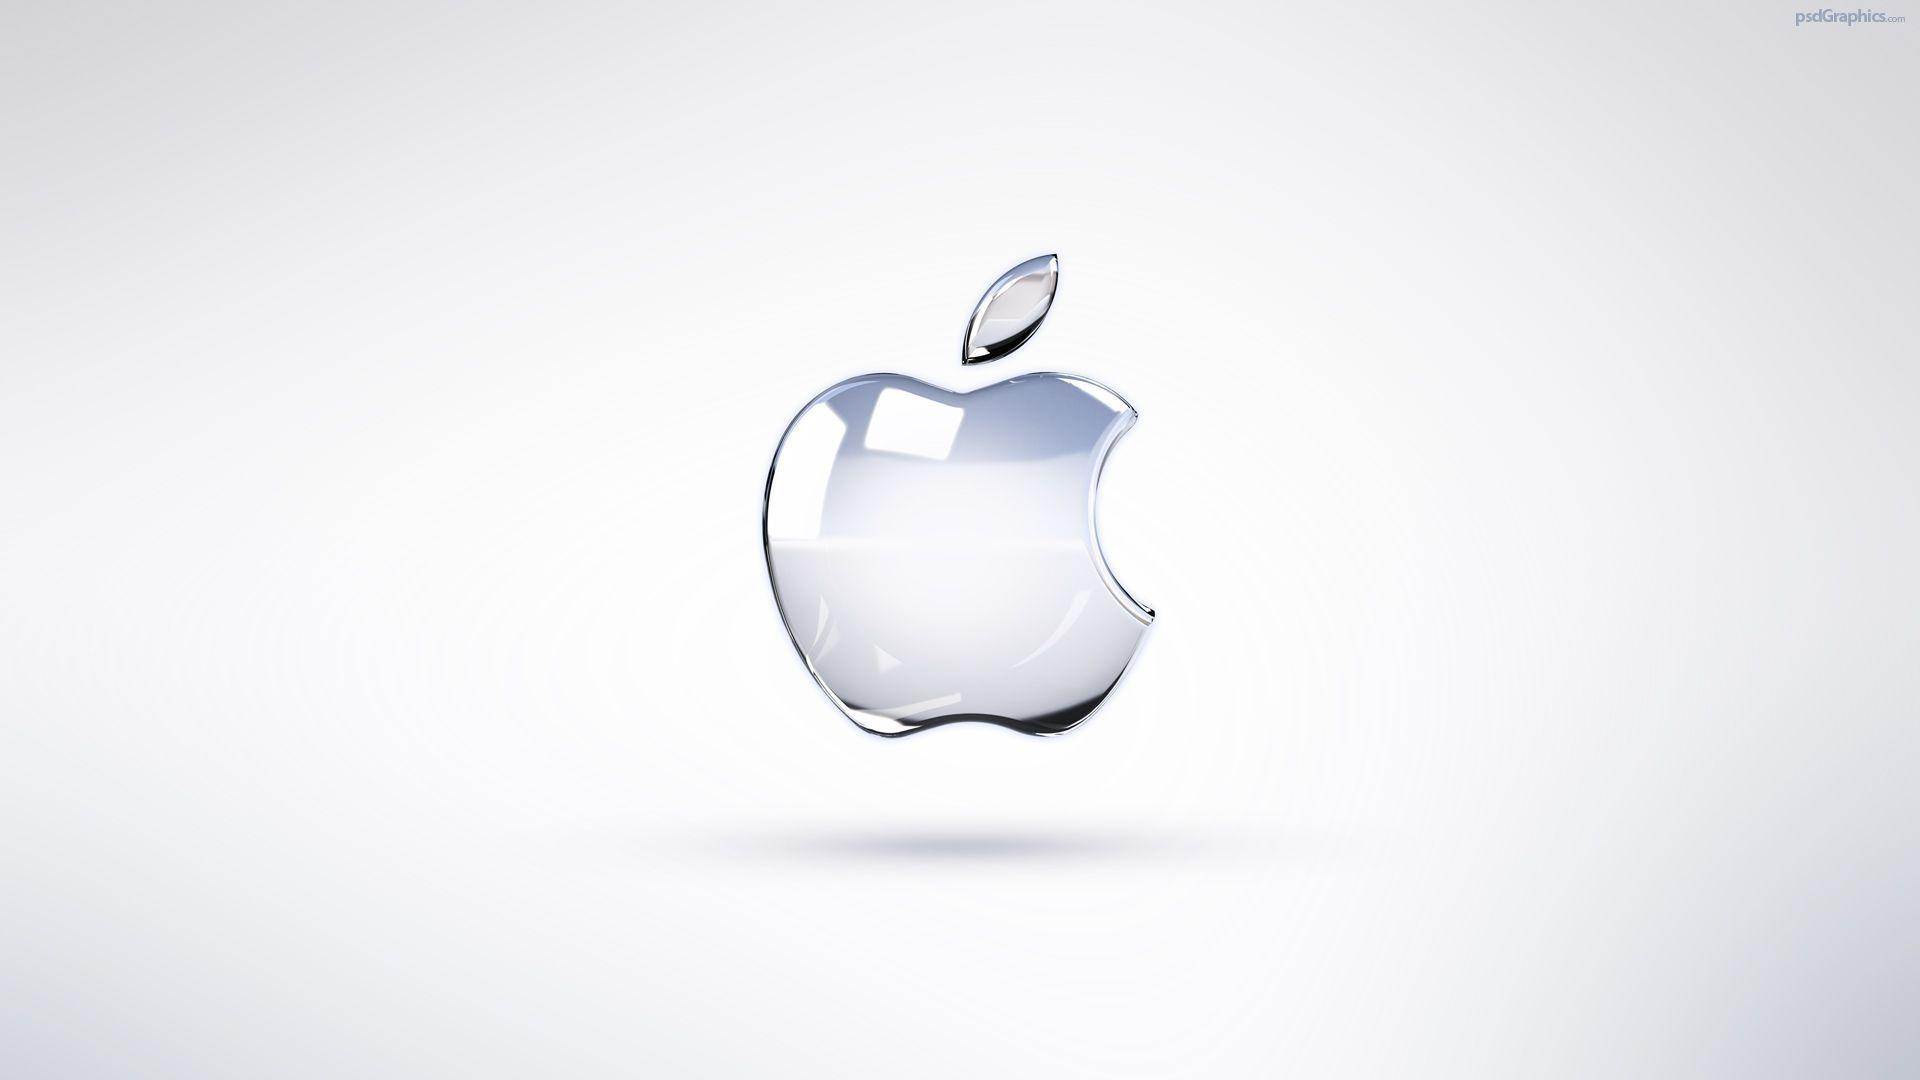 Apple Wallpaper Hd 1080p Wallpapertag